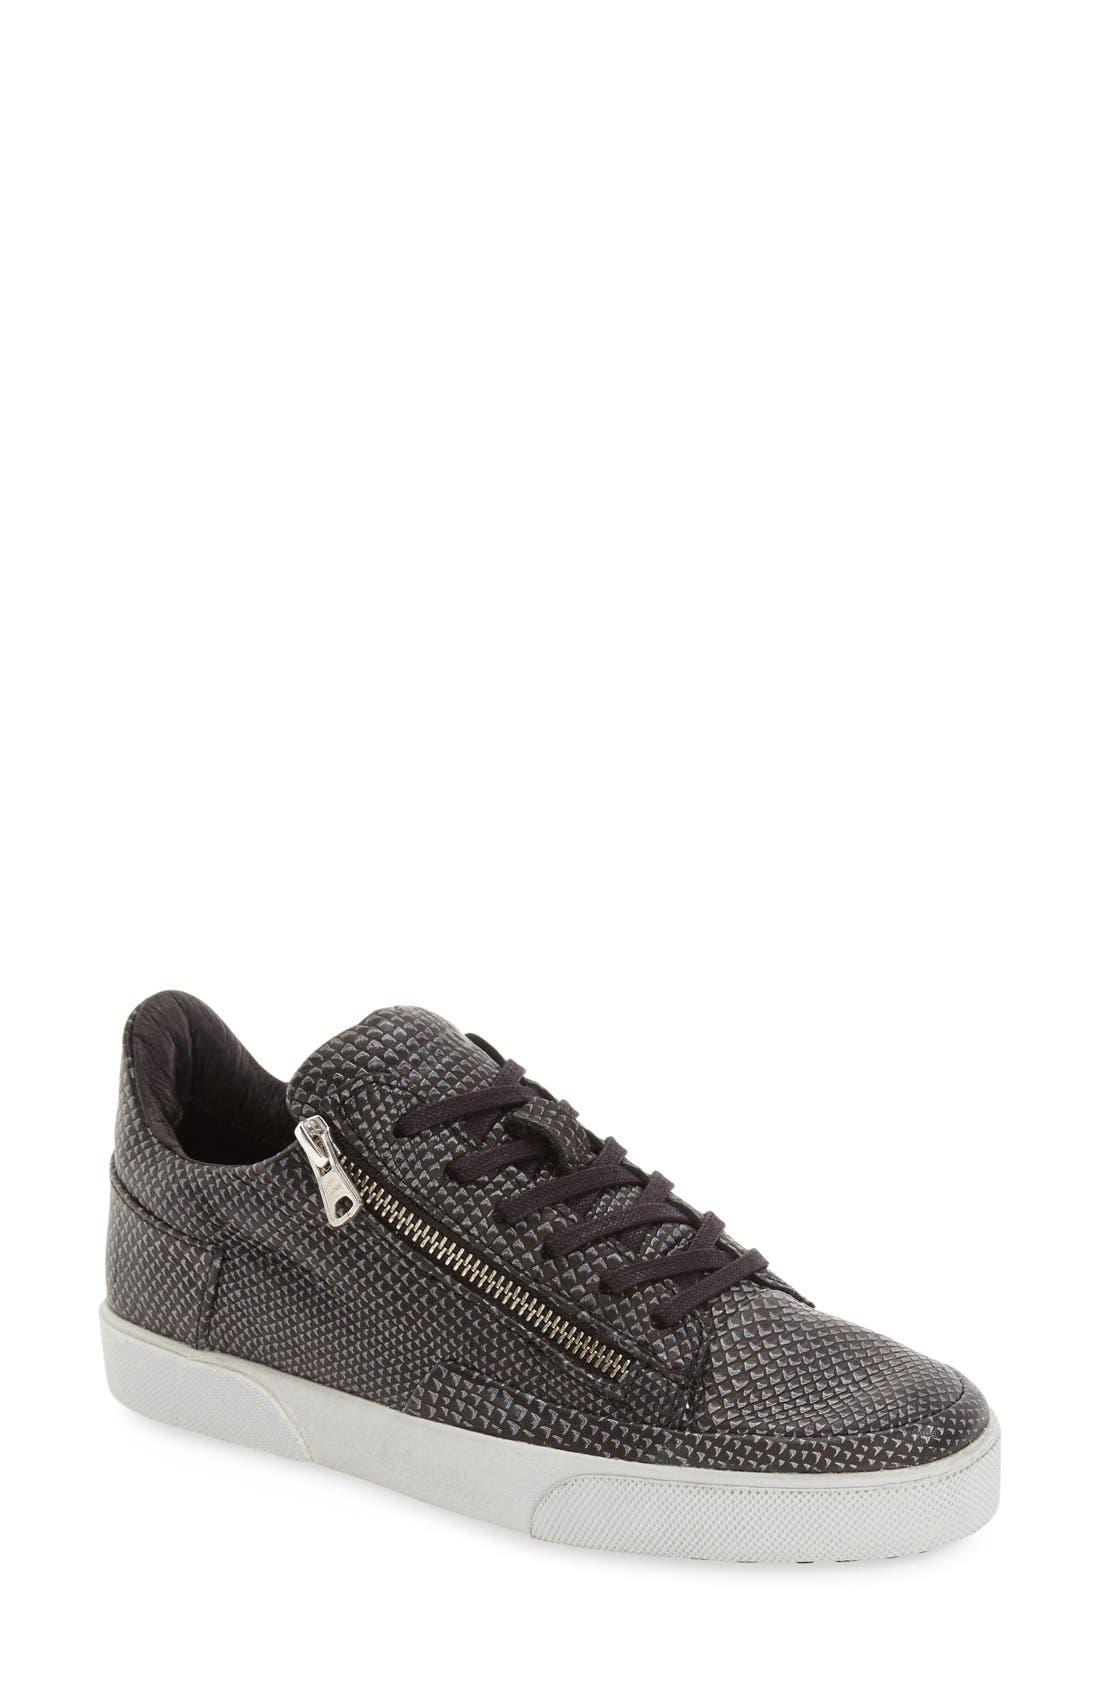 'KL51' Sneaker,                         Main,                         color, Black Metallic Printed Leather